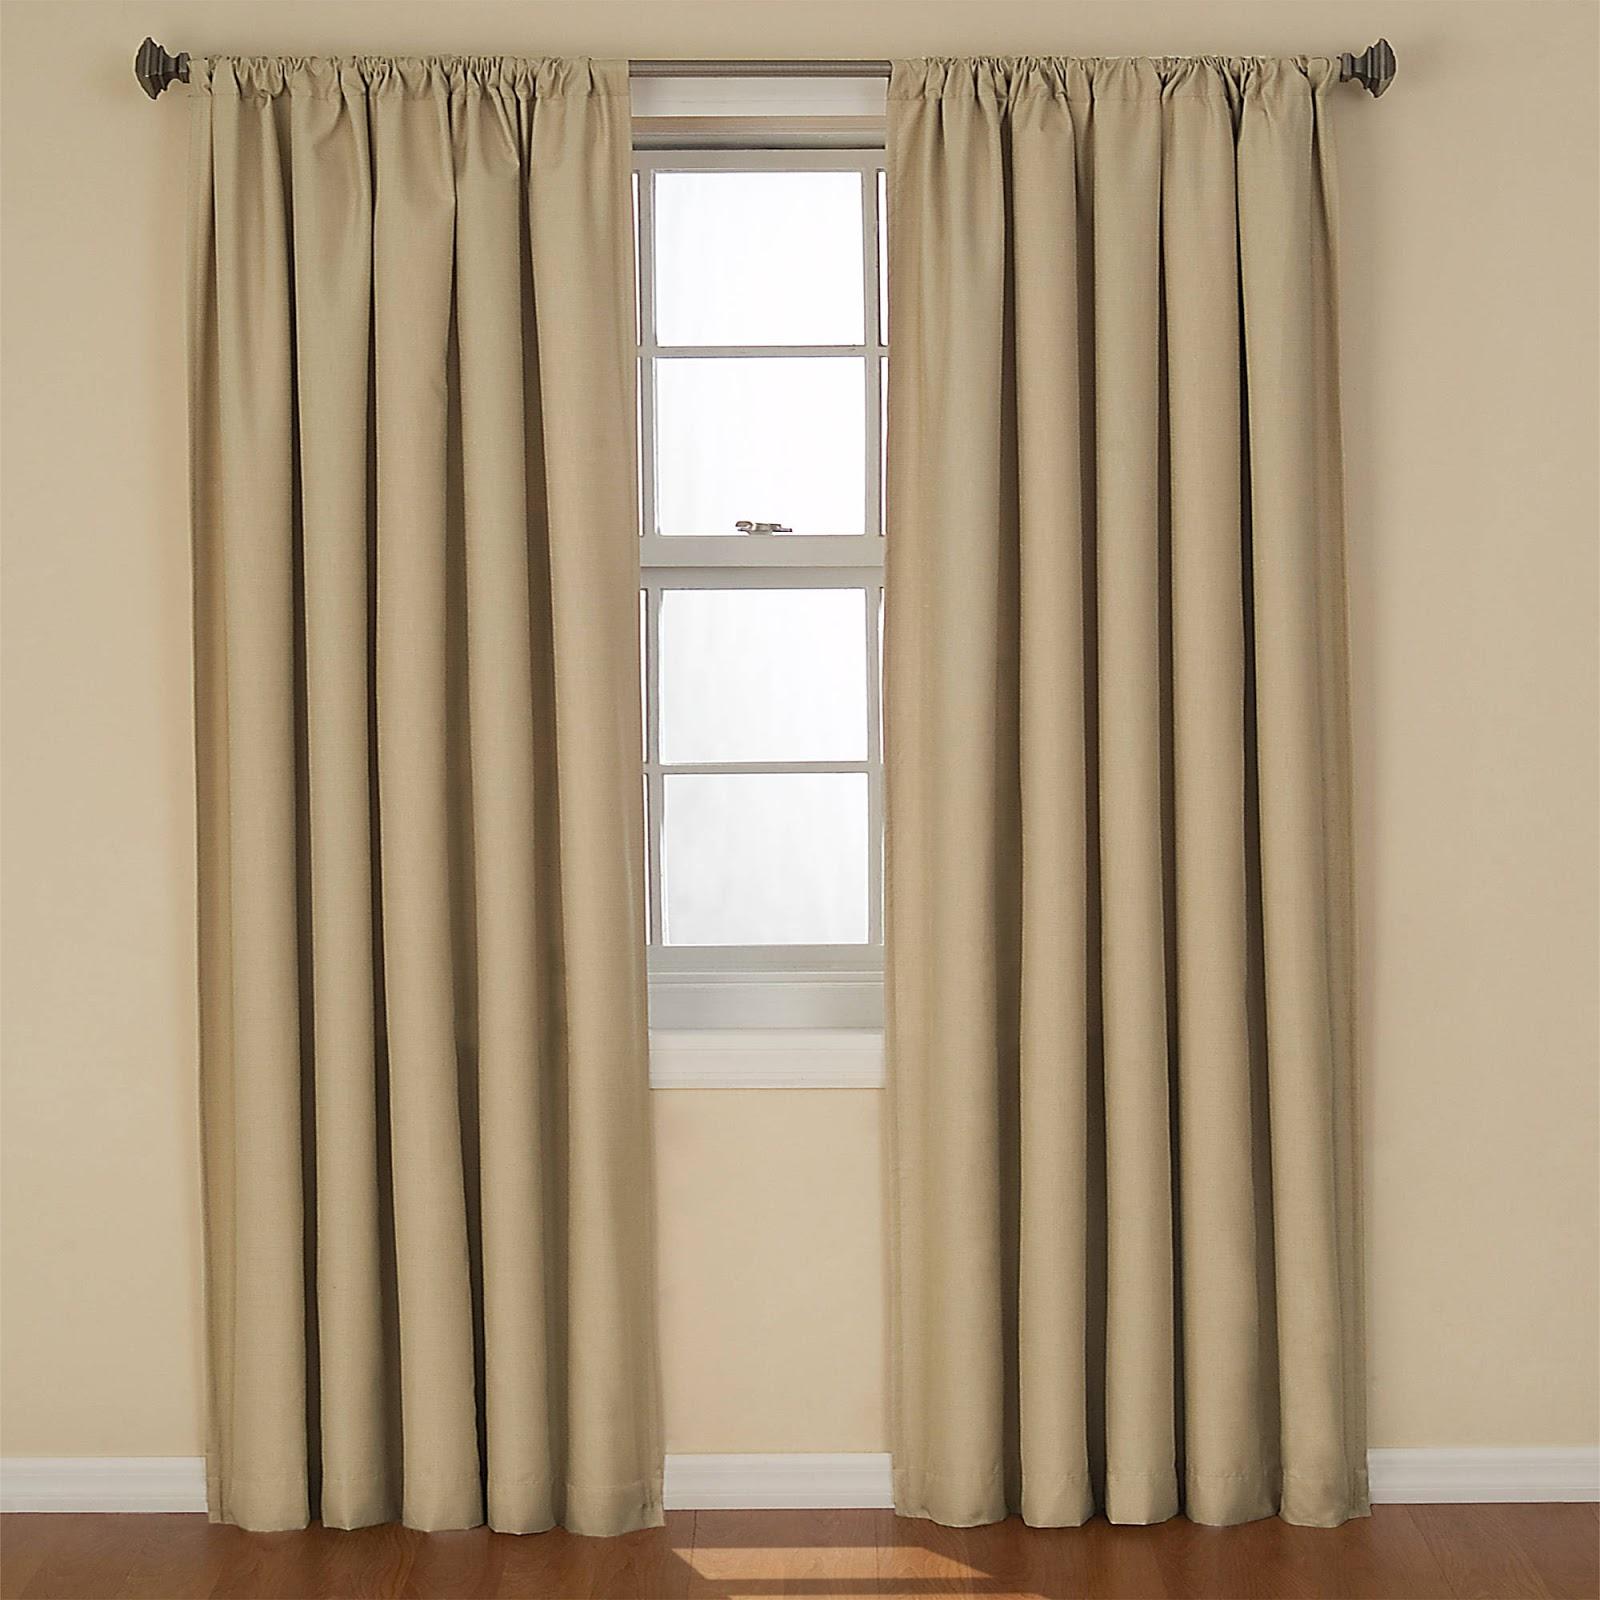 Diy Curtain Closet Door Decor Finials Grommets